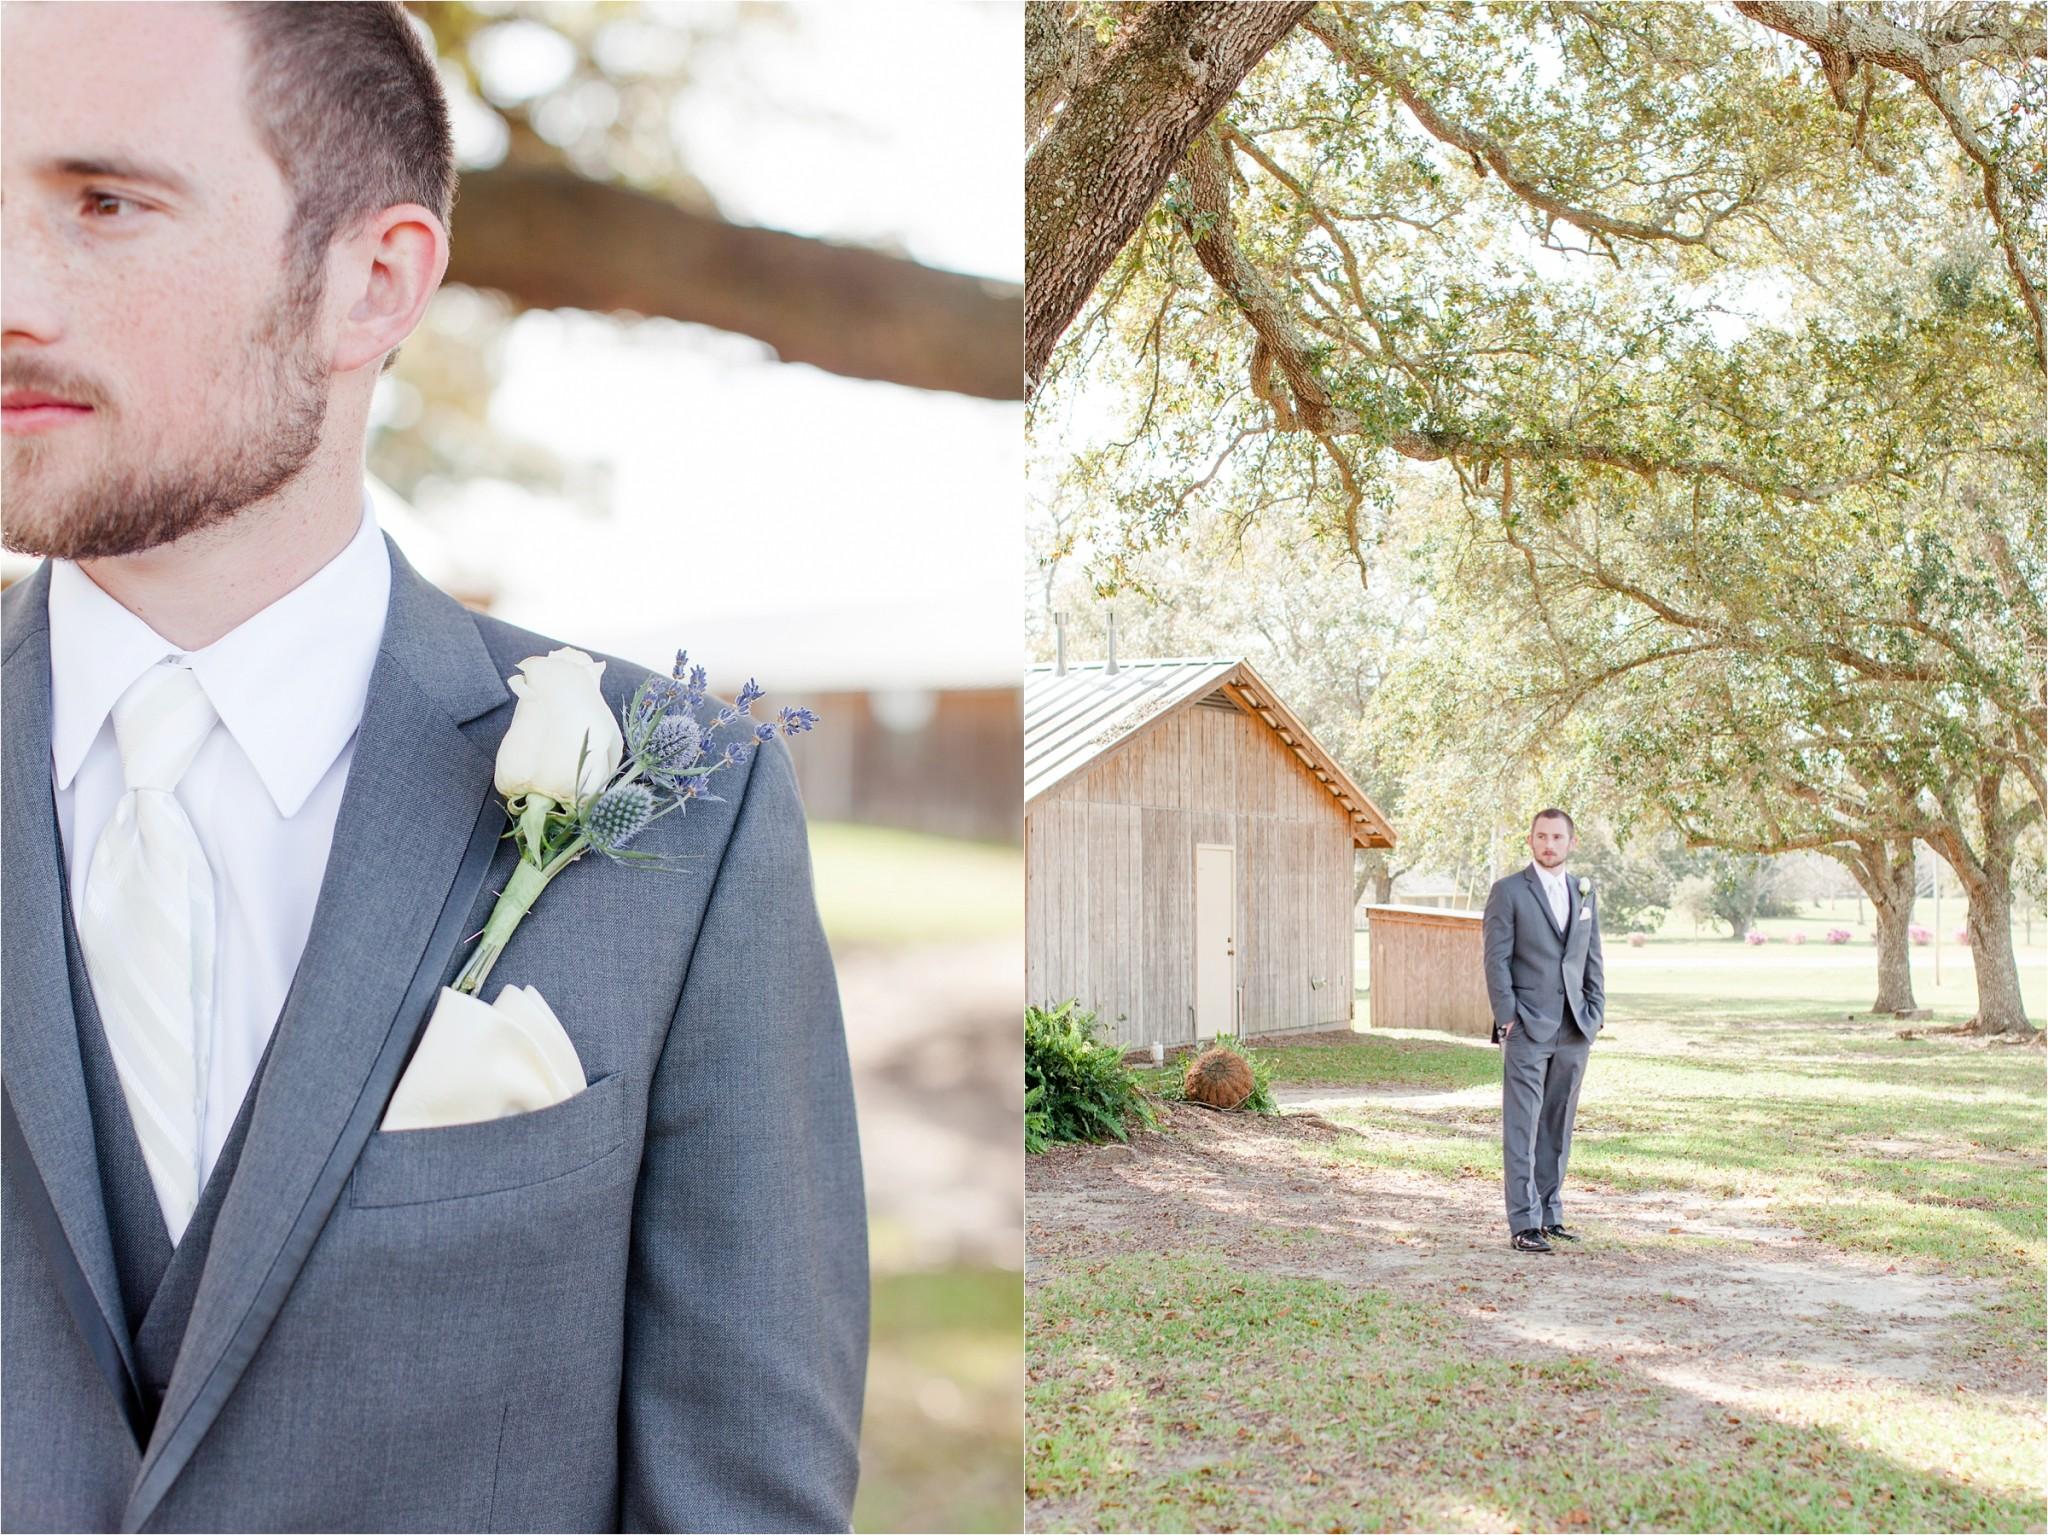 the groom at his Oak Hollow Farm Wedding